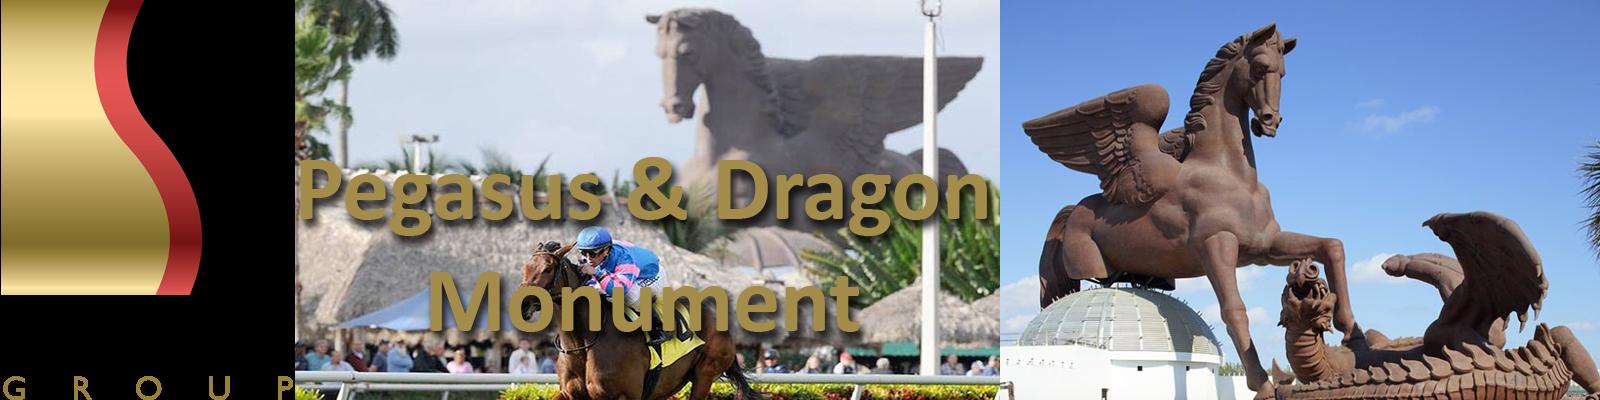 Pegasus & Dragon the Monument